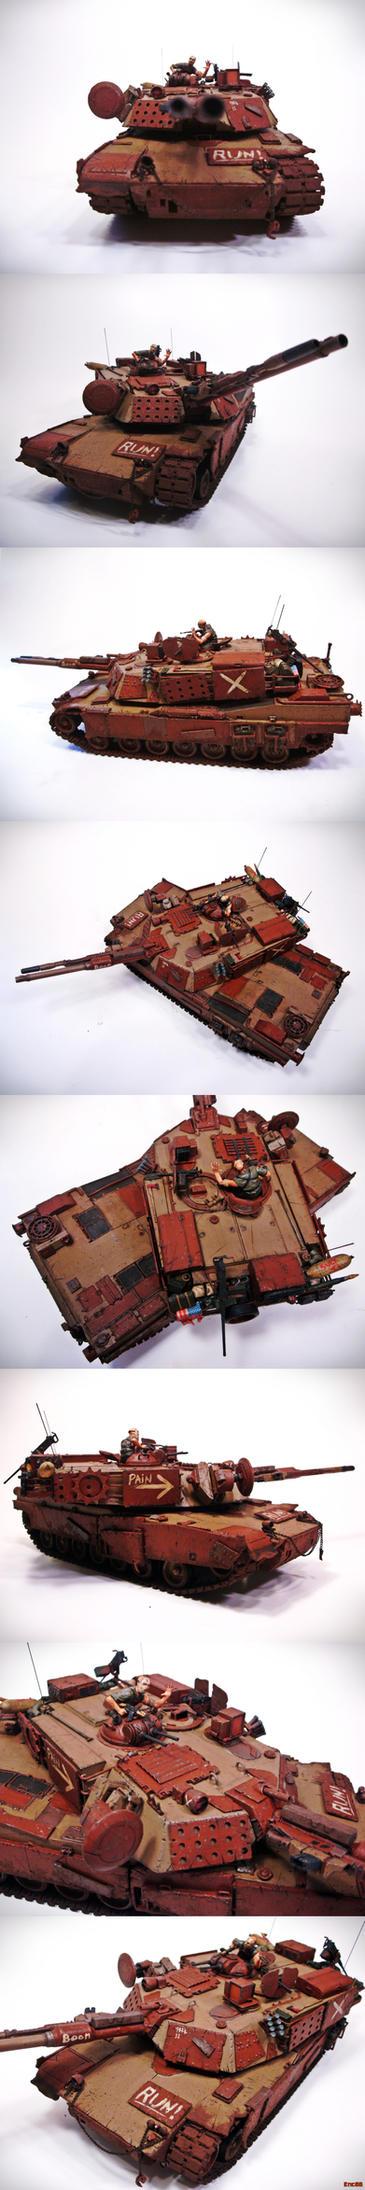 Abrams Redux Collage by enc86